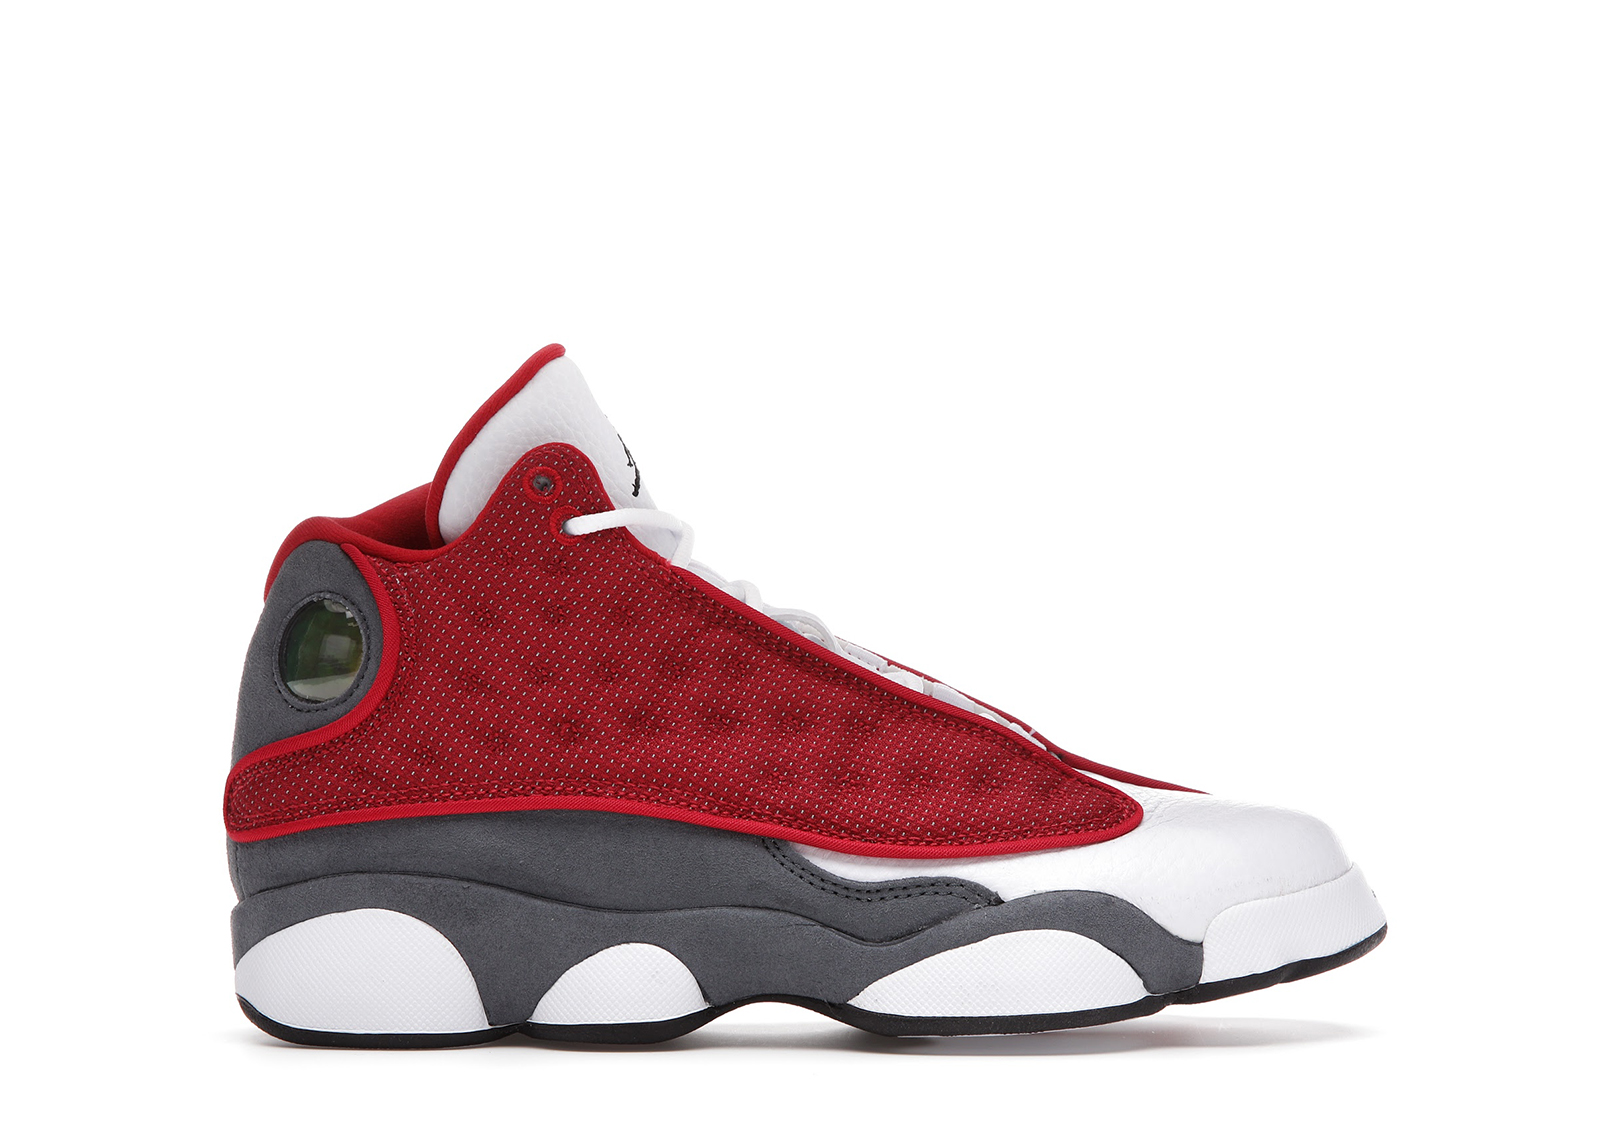 Jordan 13 Retro Gym Red Flint Grey (GS)